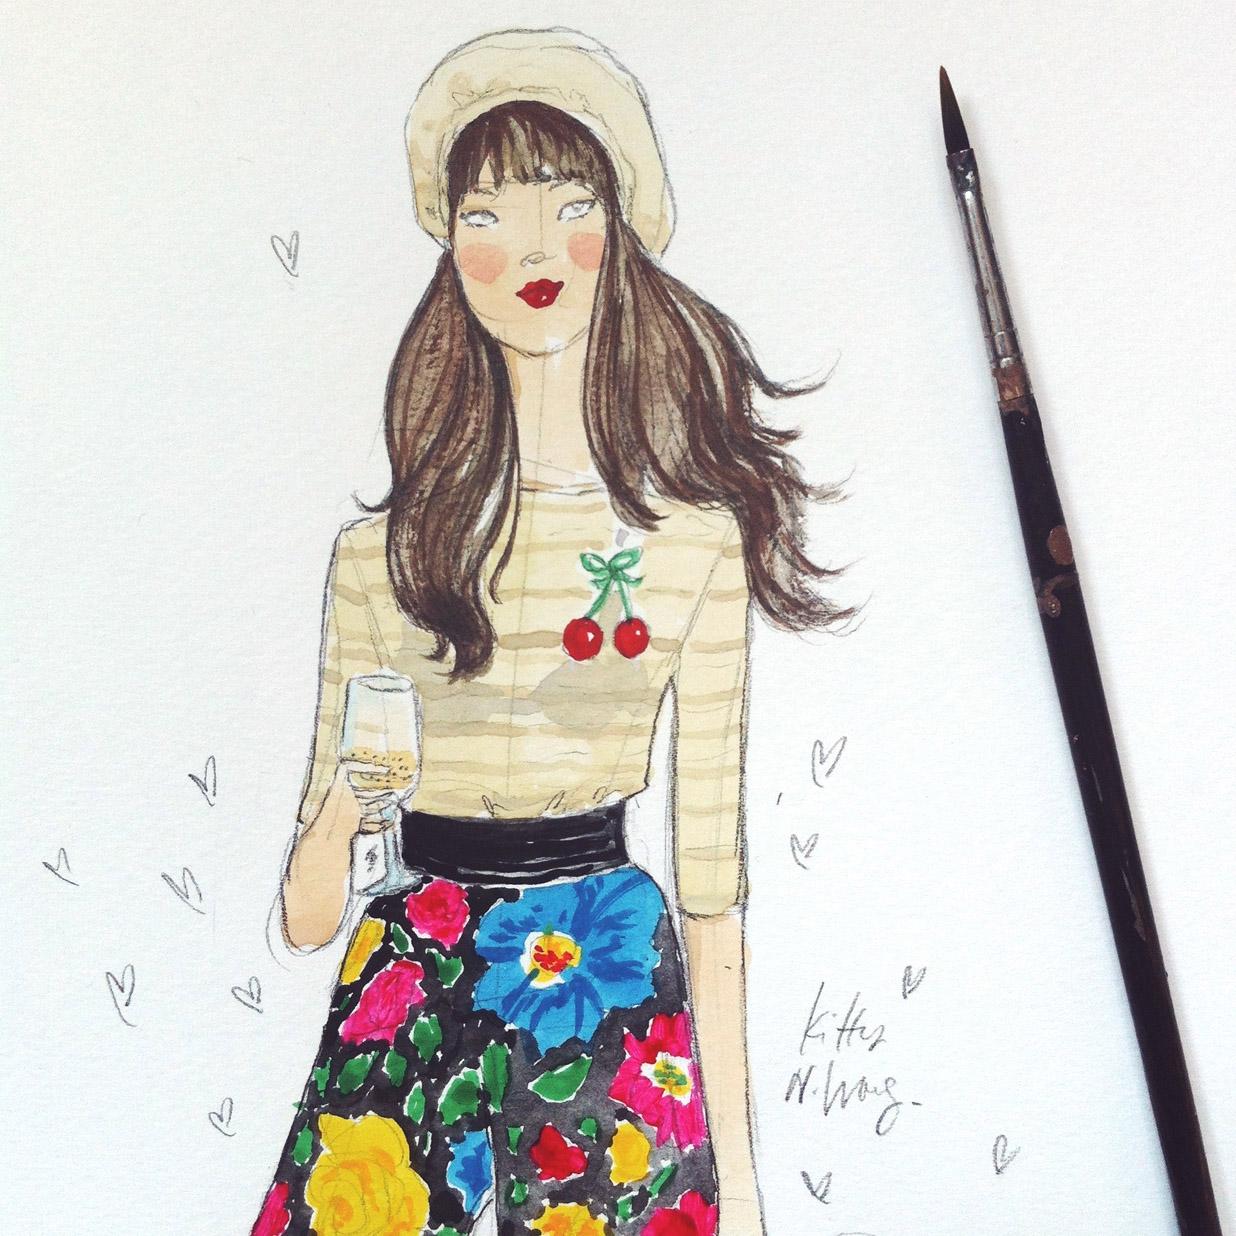 Kitty N. Wong / Affordable Art Fair streetstyle illustration